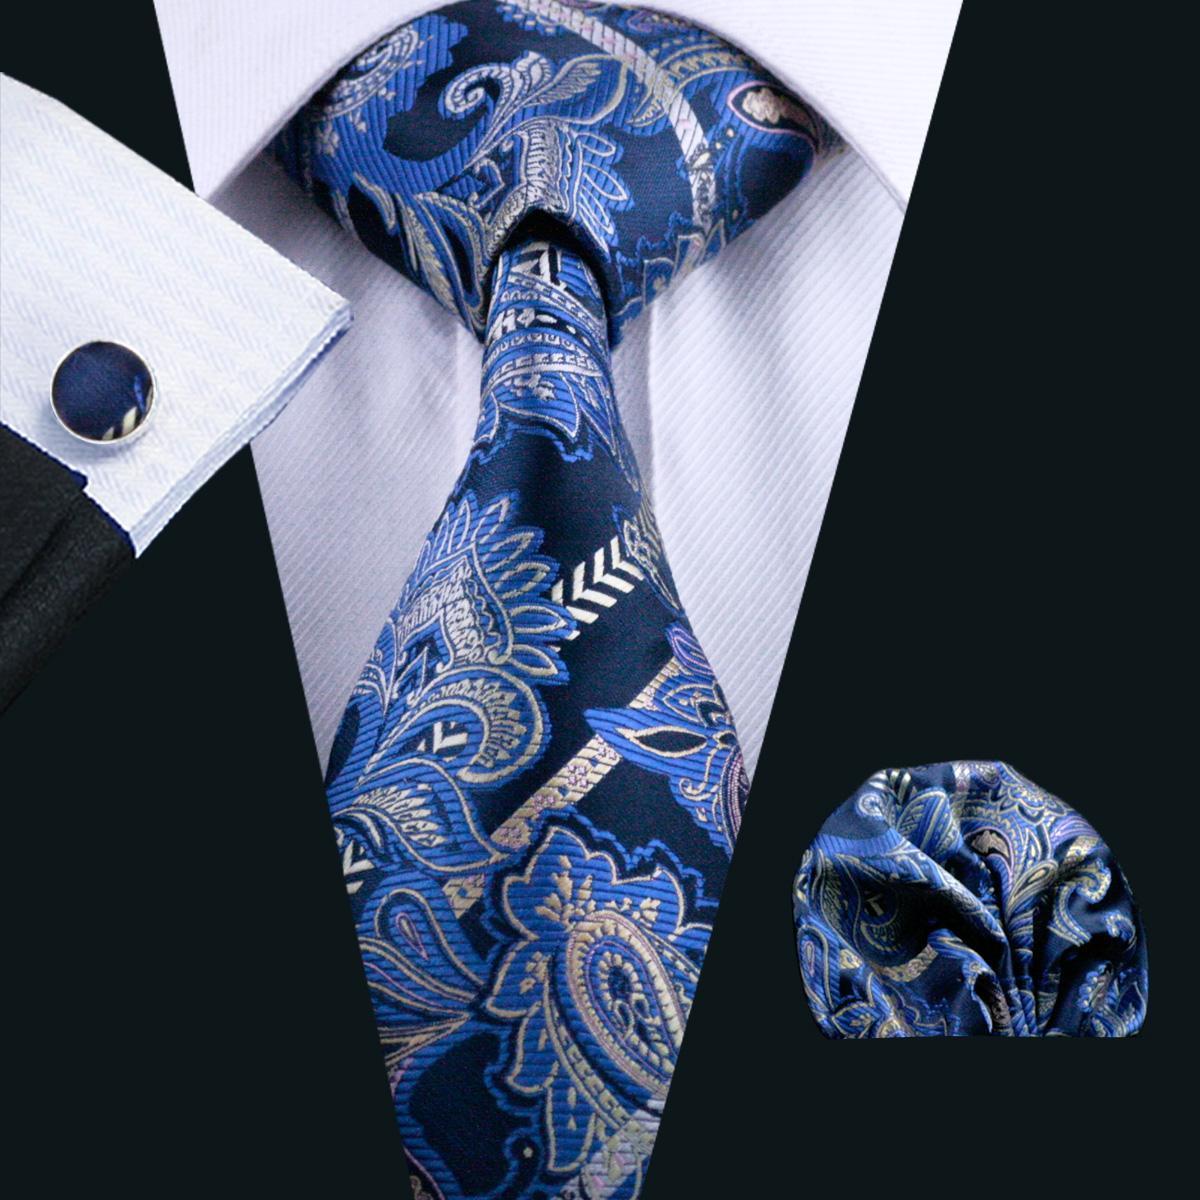 Stropdas Hankerchief Manchetknopen Set Blauw Paisely Jacquard Woven Mens Tie Set Bedrijfswerk Formele Bruiloft N-0613